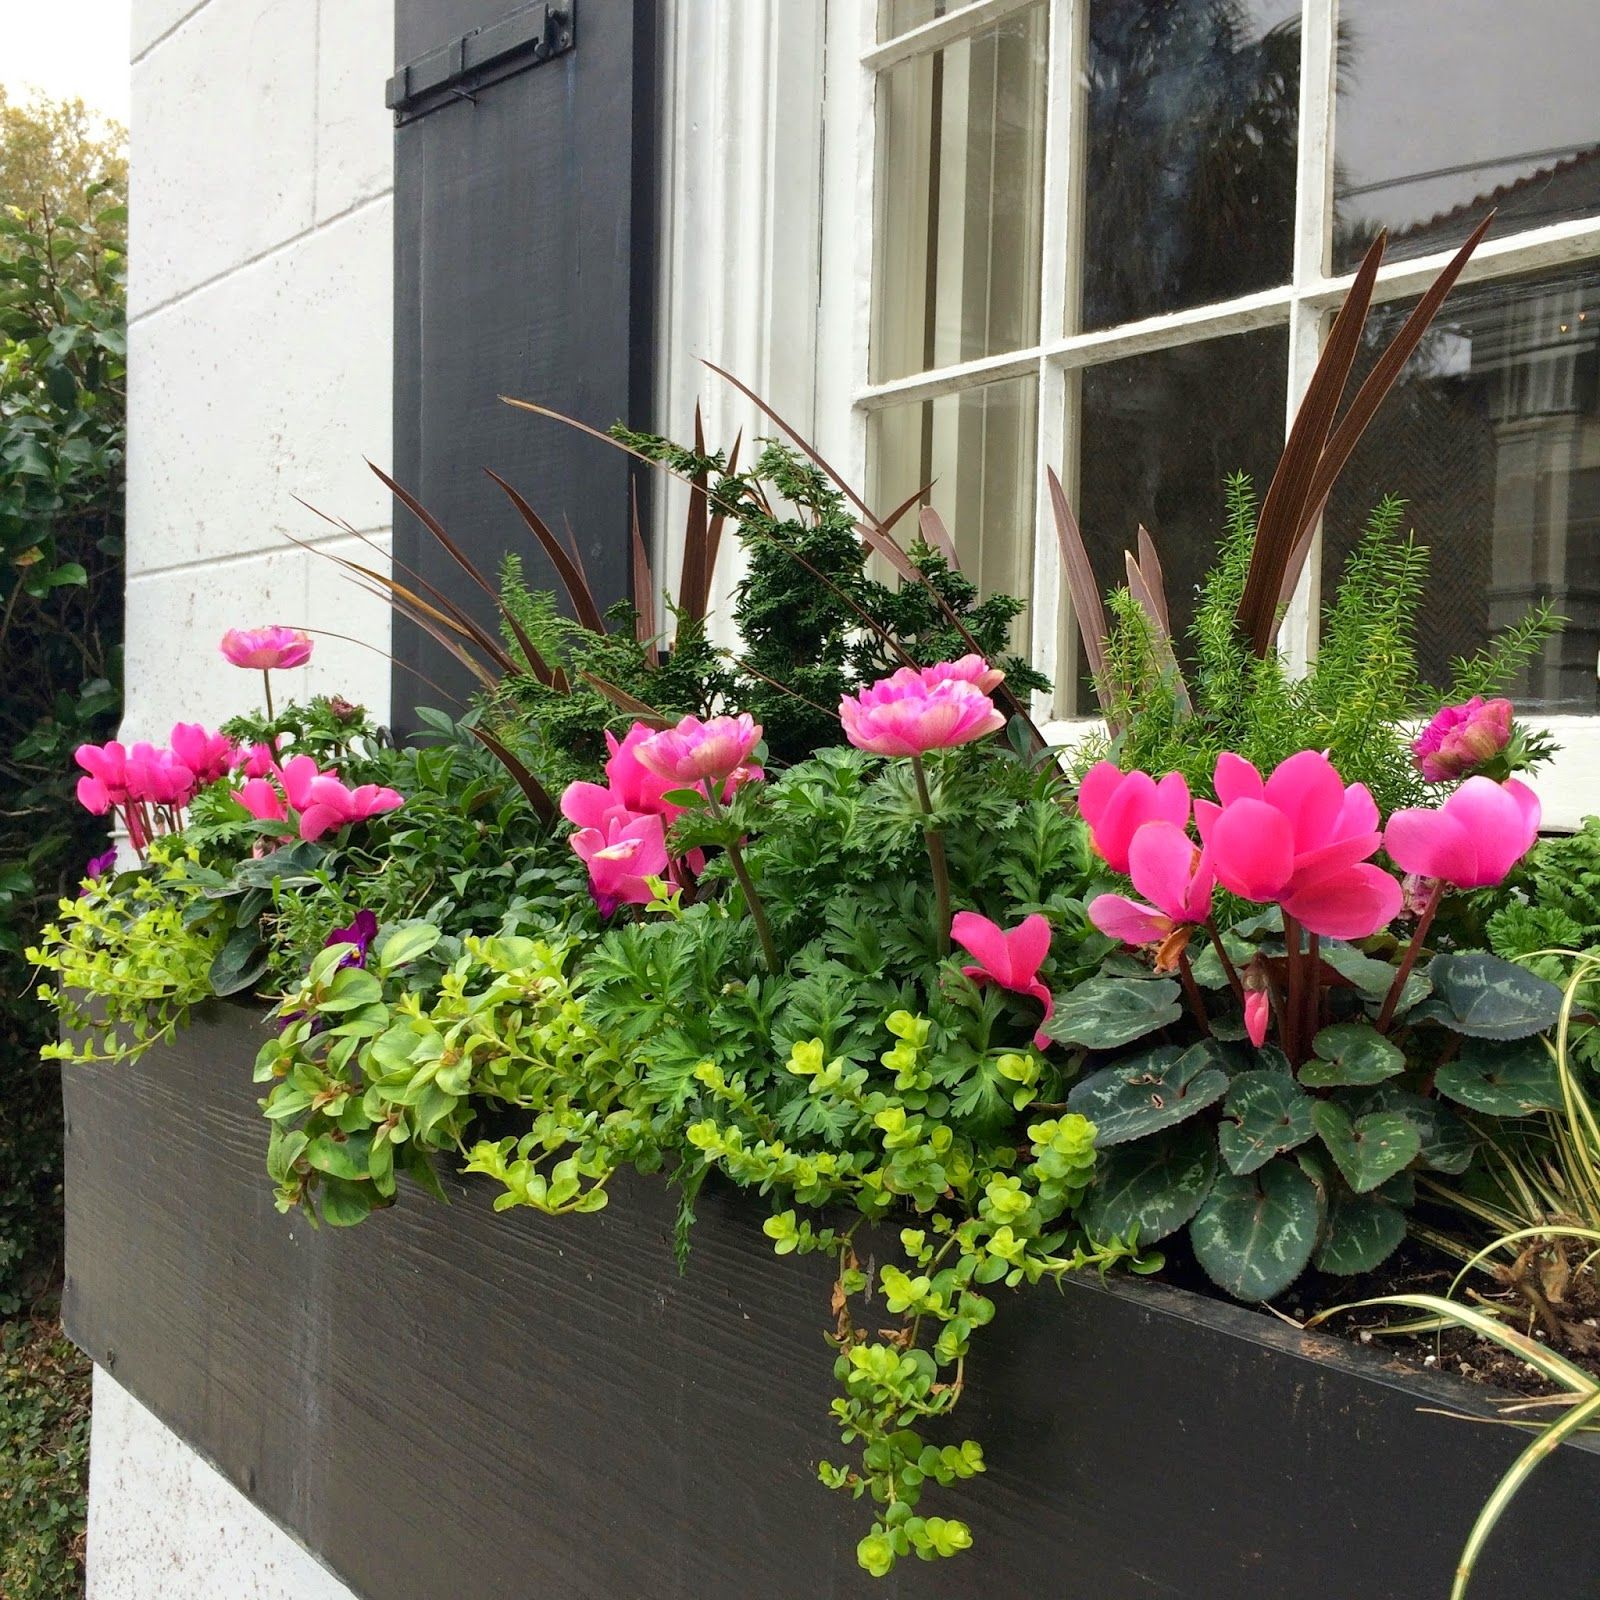 Window Box Planter Ideas: THE DEFINITIVE GUIDE TO WINDOW BOX DESIGN